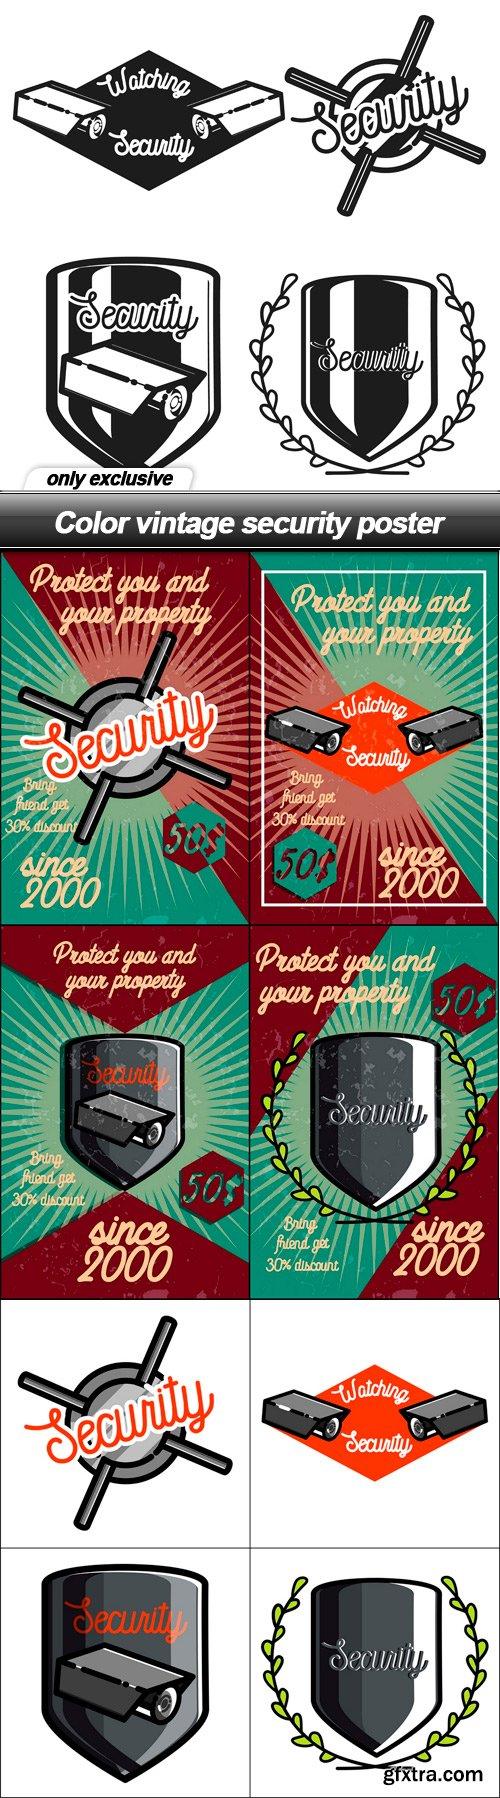 Color vintage security poster - 9 EPS